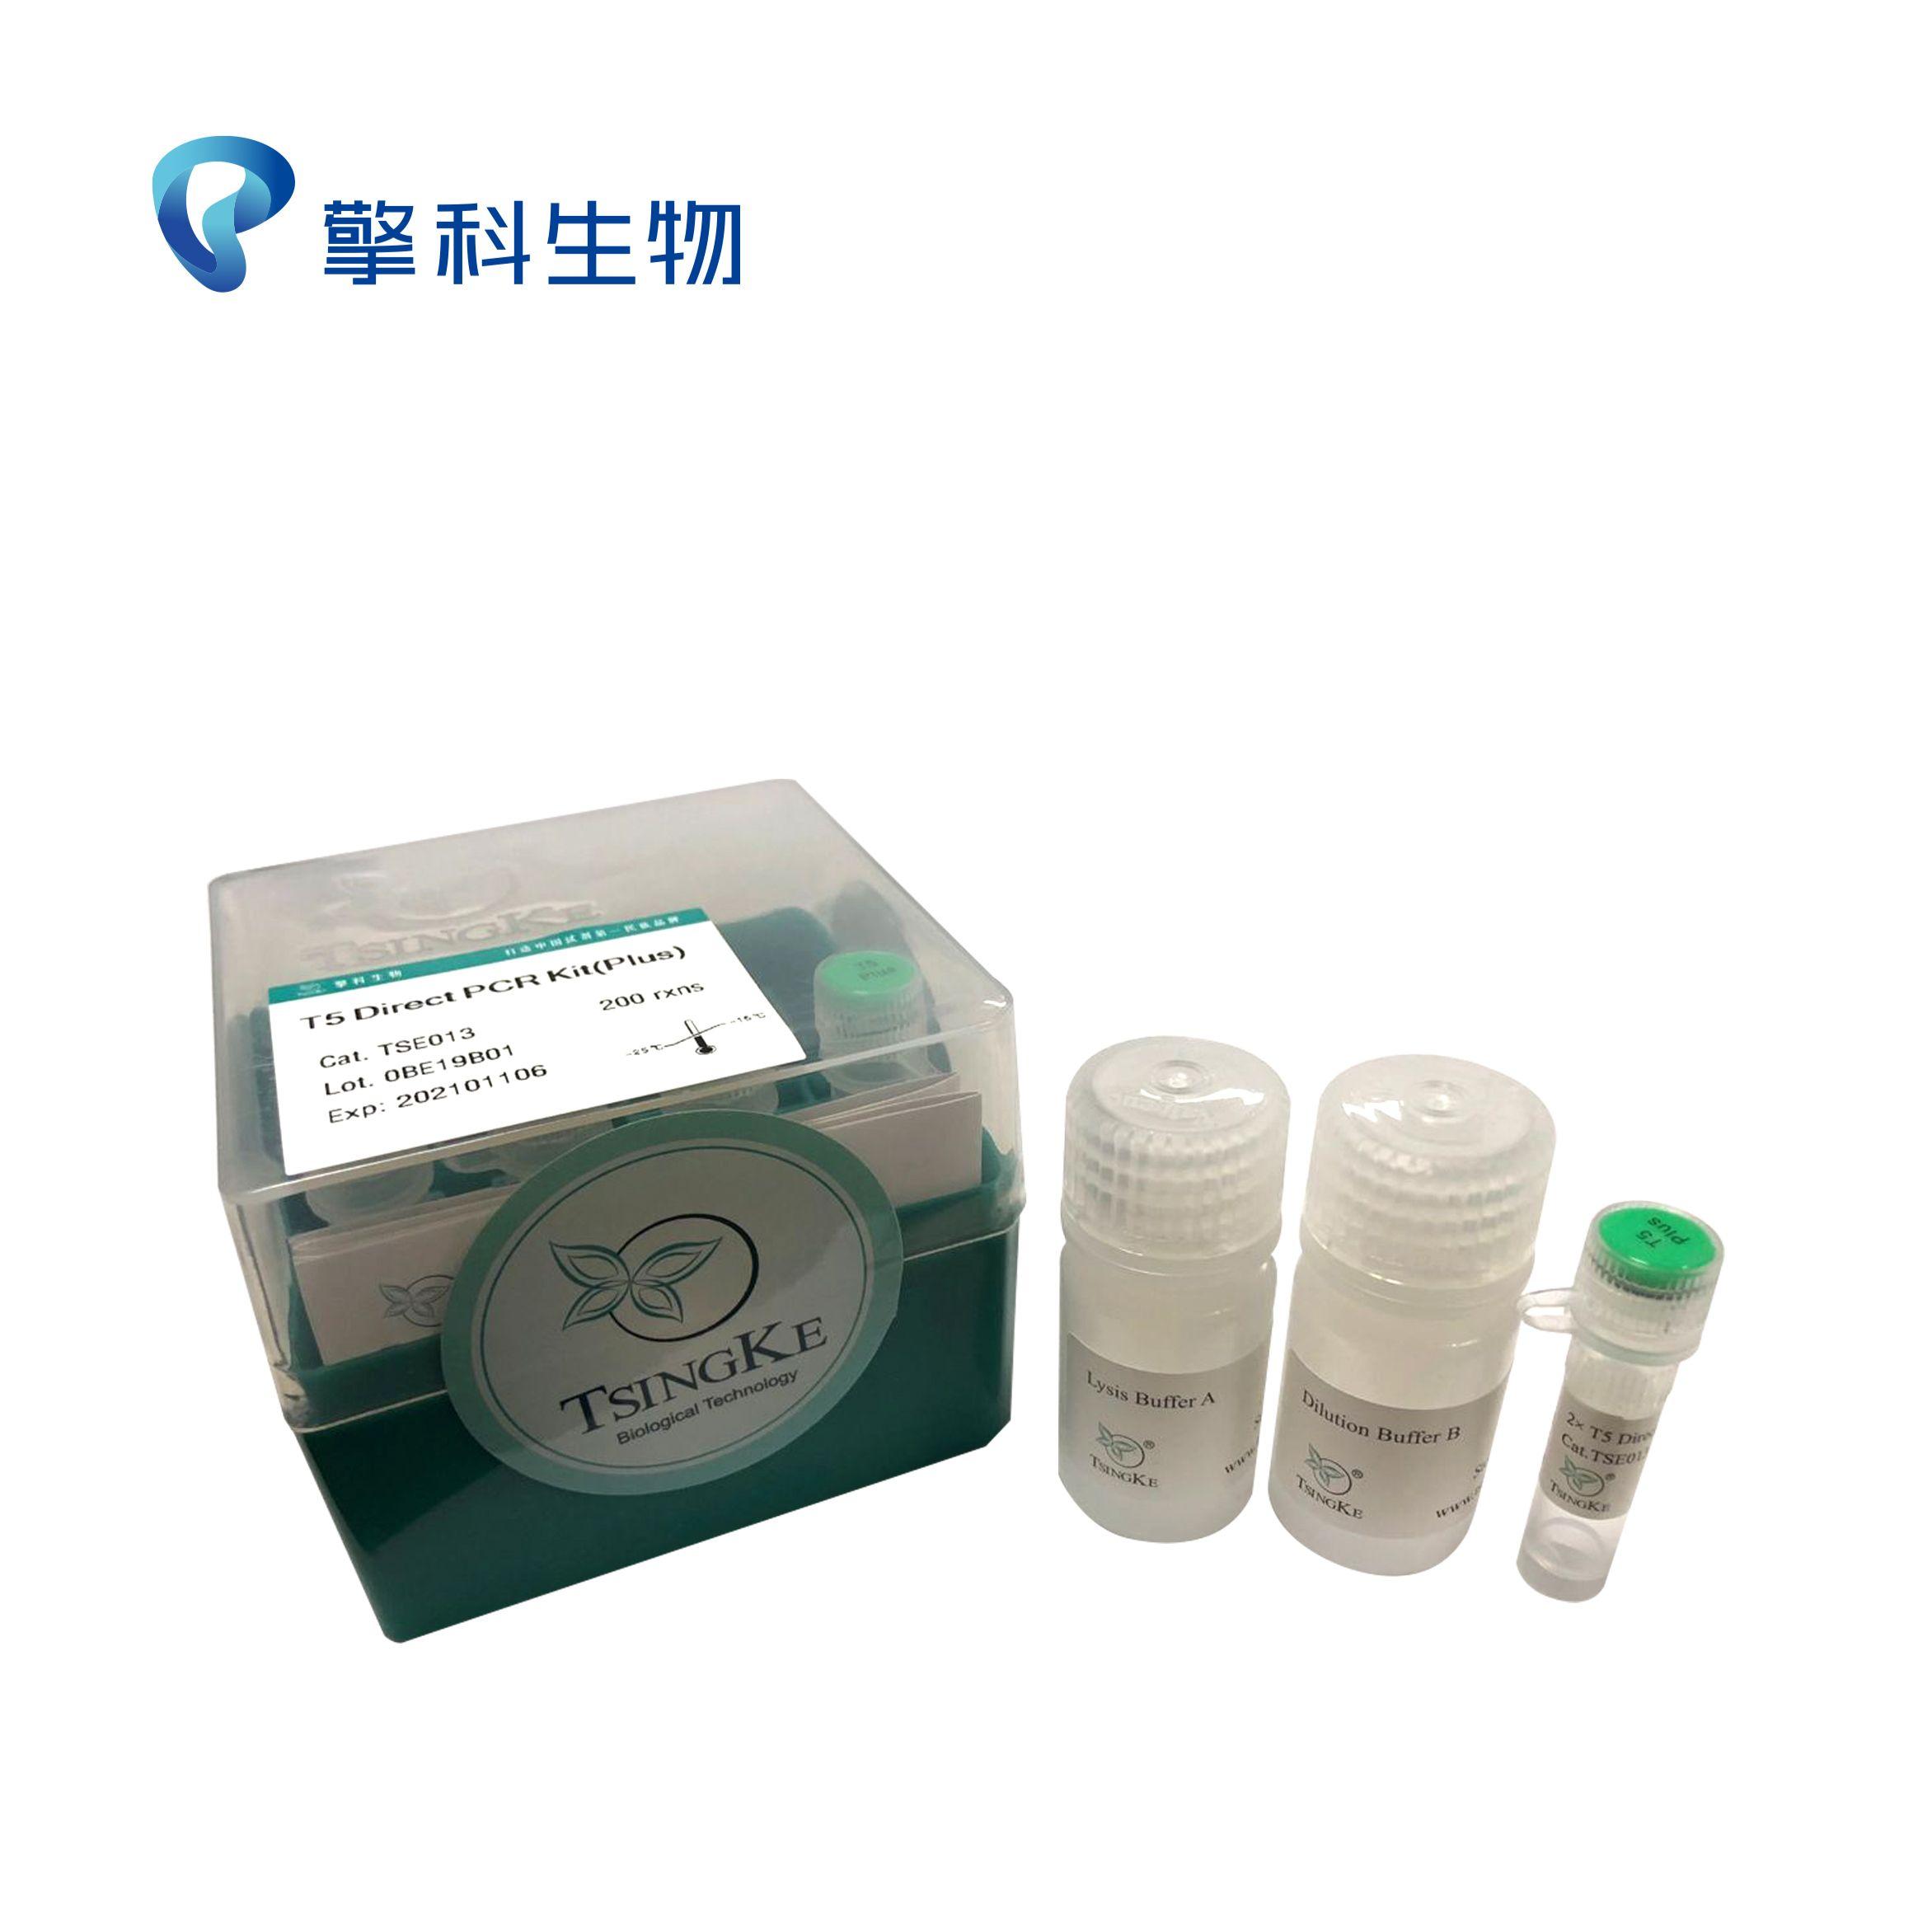 T5 Direct PCR kit (Plus)/多种生物样品的直接扩增,高保真度,极速延伸(10s/kb)/PCR系列/擎科生物TSINGKE